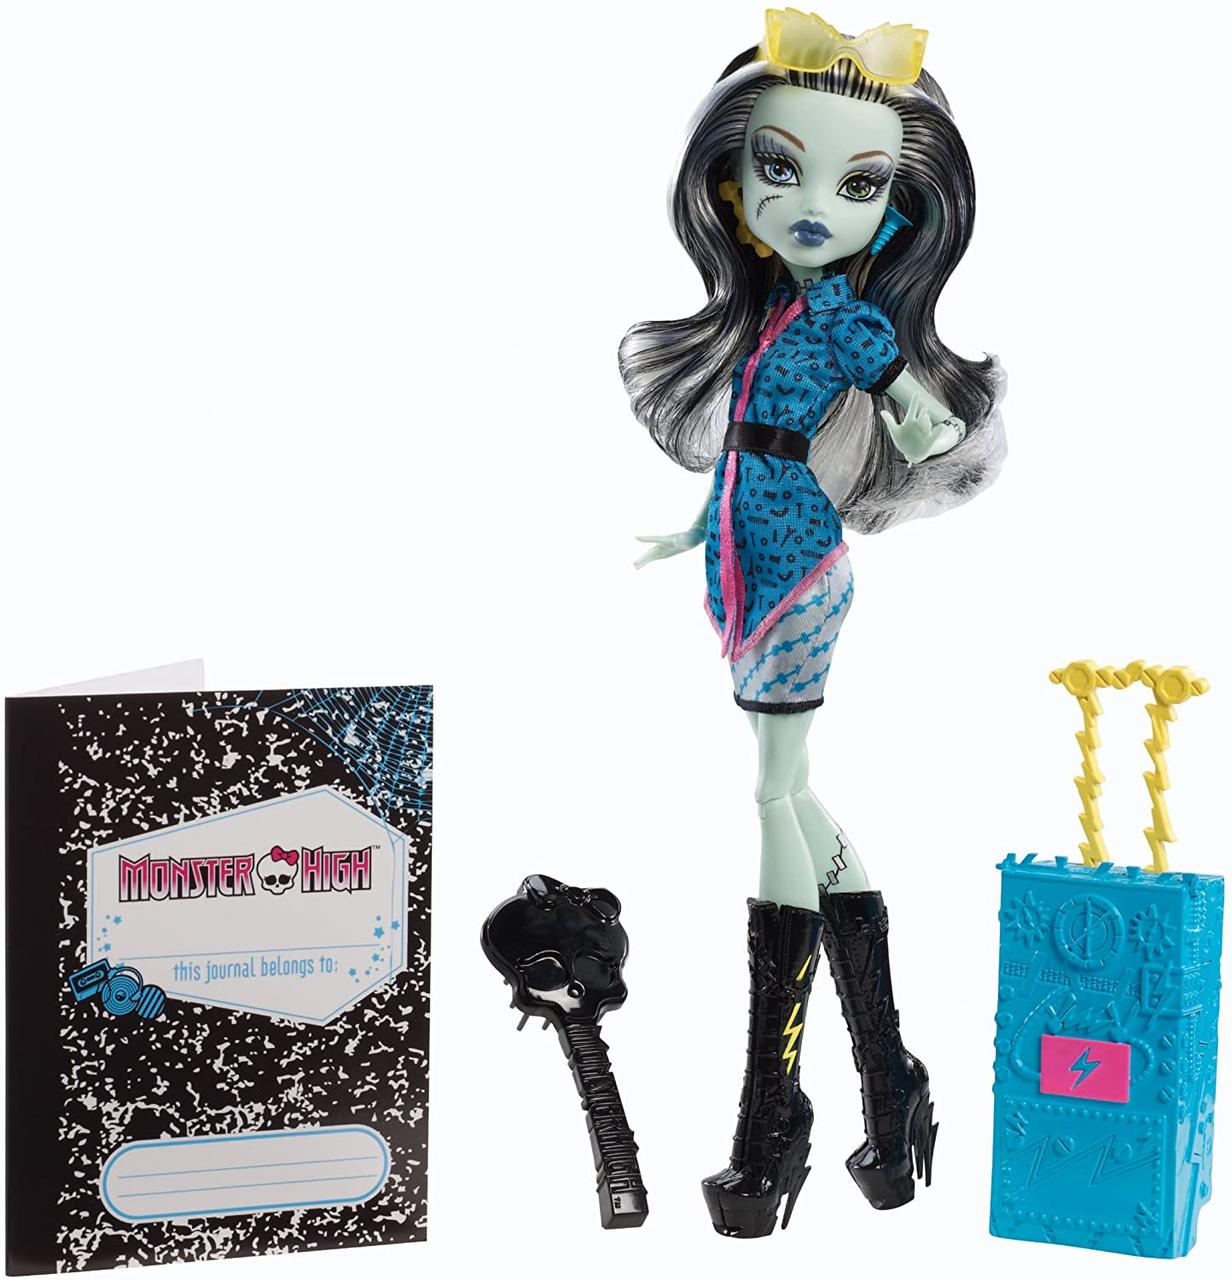 Кукла Френки Штейн путешествие в Скариж Город Страхов монстер хай Monster High Travel Scaris Frankie Stein